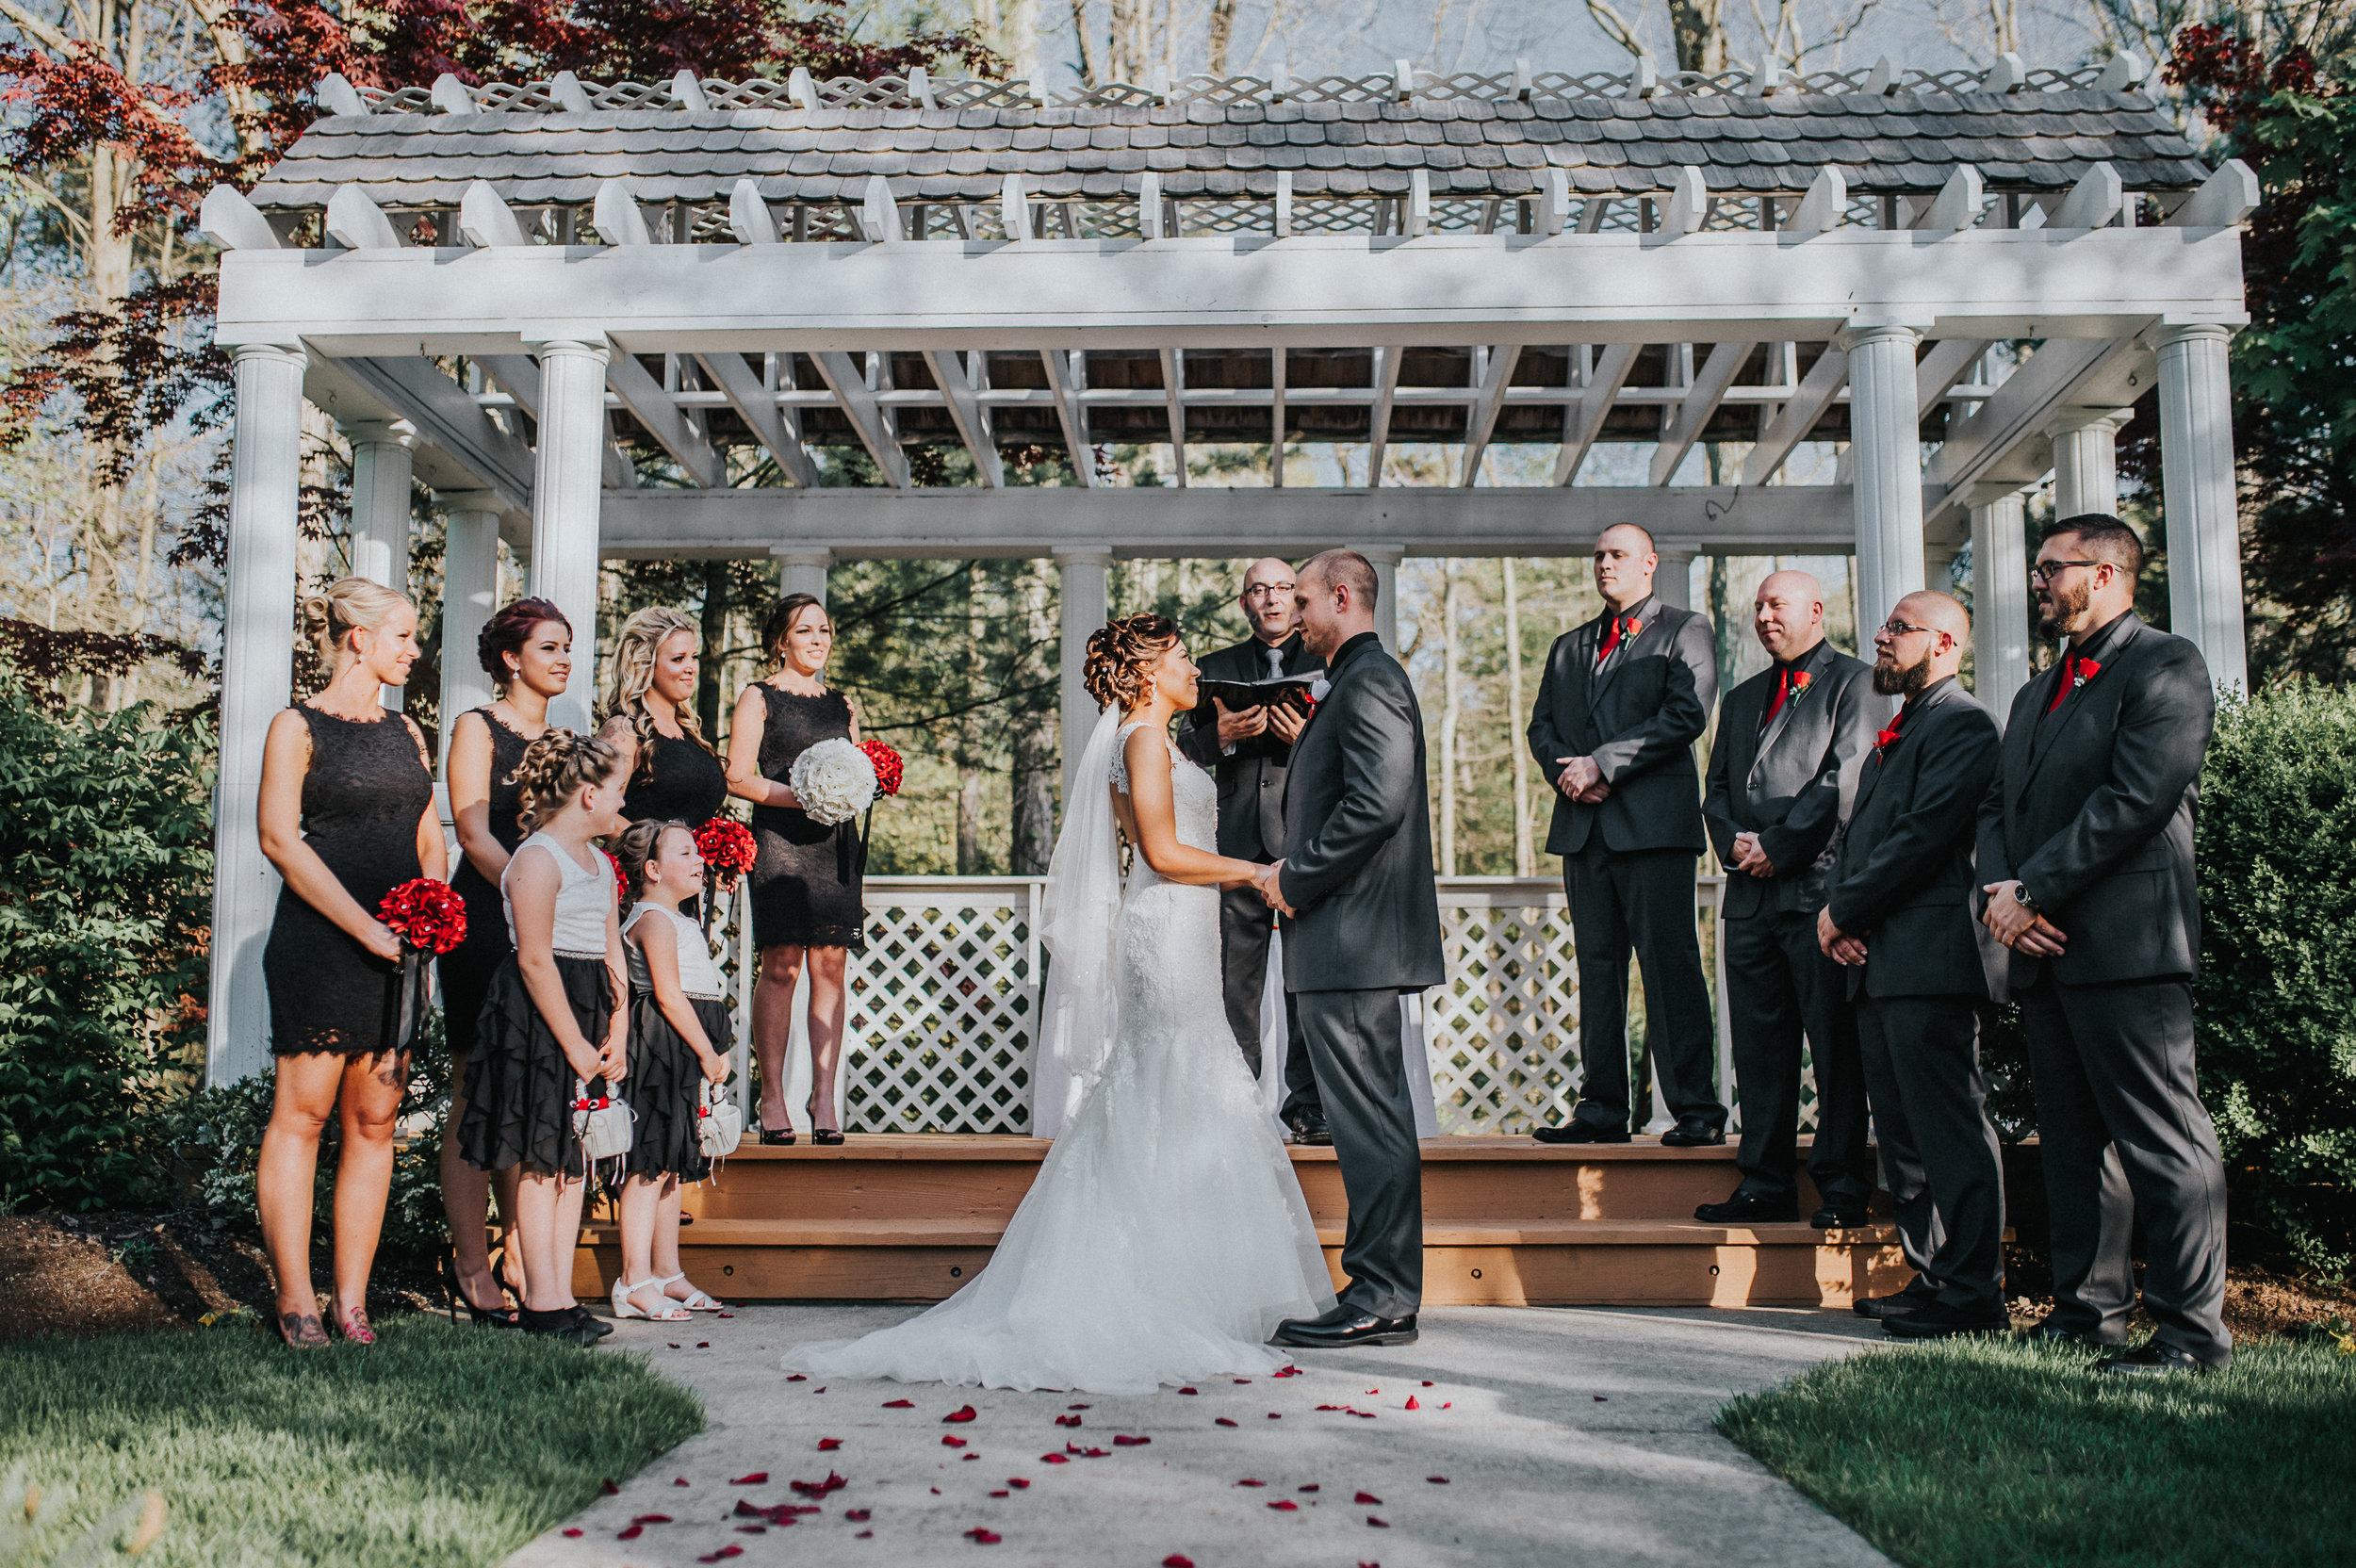 Christina-and-Gene-Wedding-Marla-Rain-Photography-326.jpg